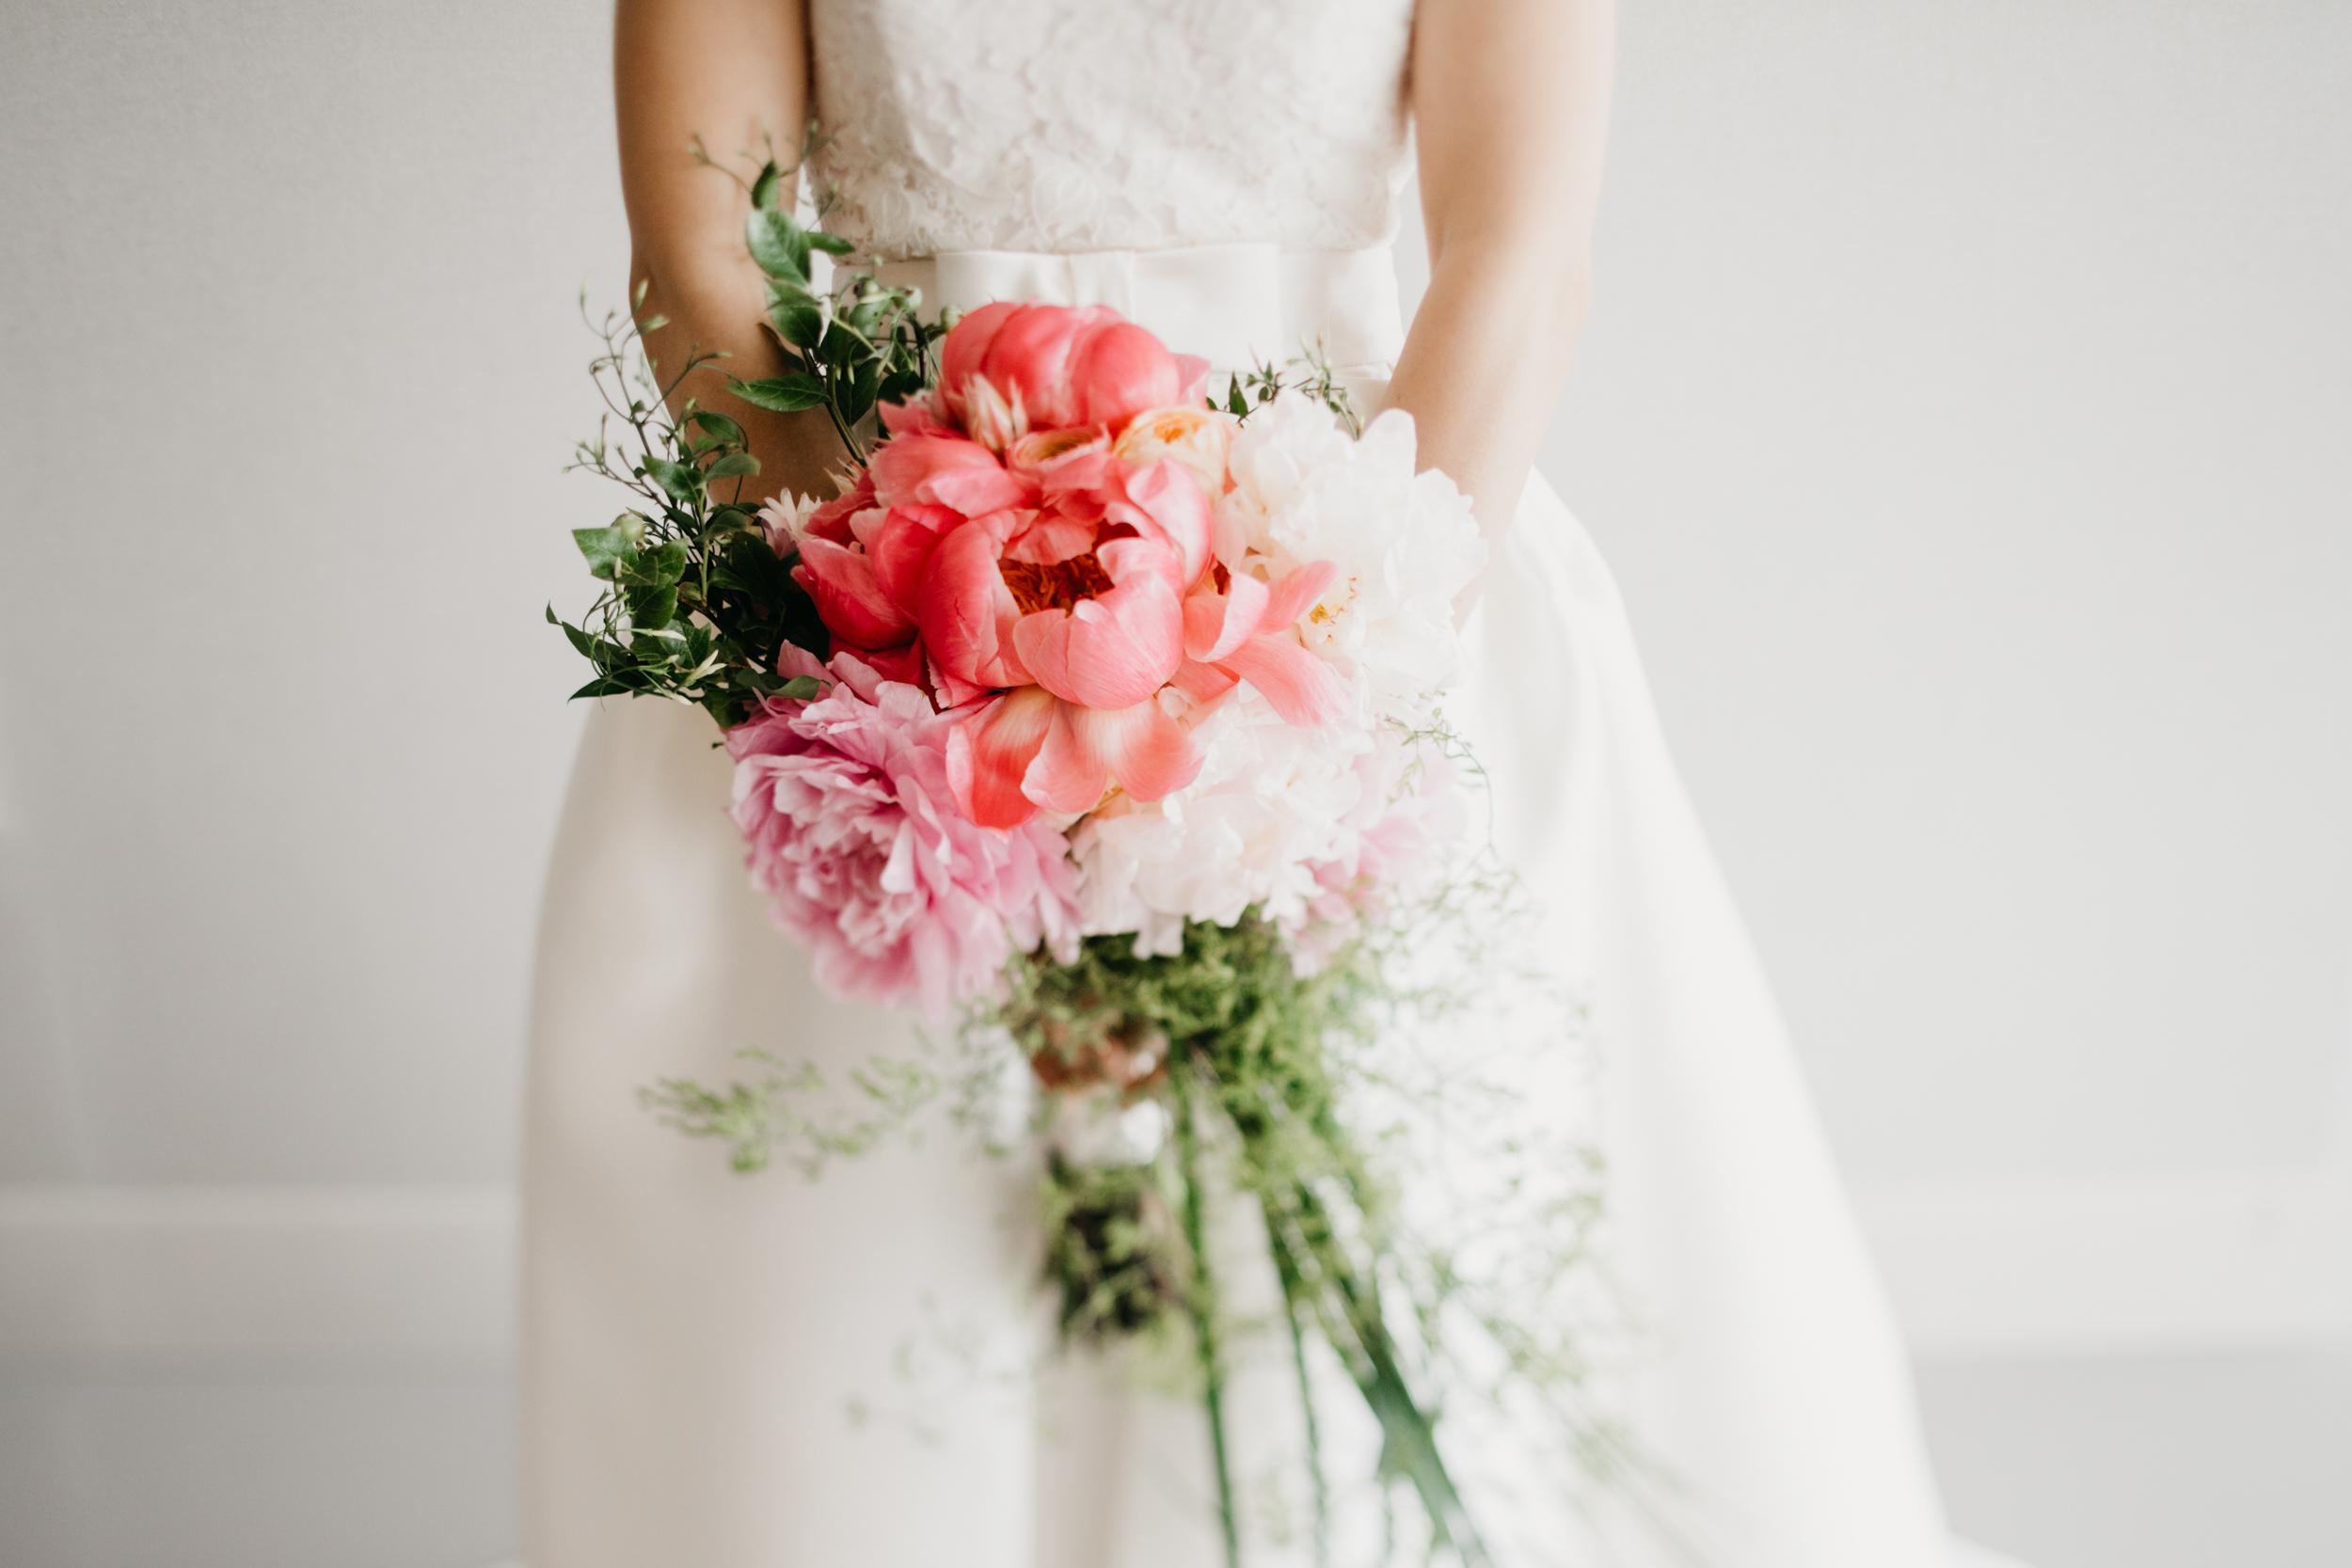 Mindy_Bo_Boston_Wedding_MIT_HotelCommonwealth_007.jpg